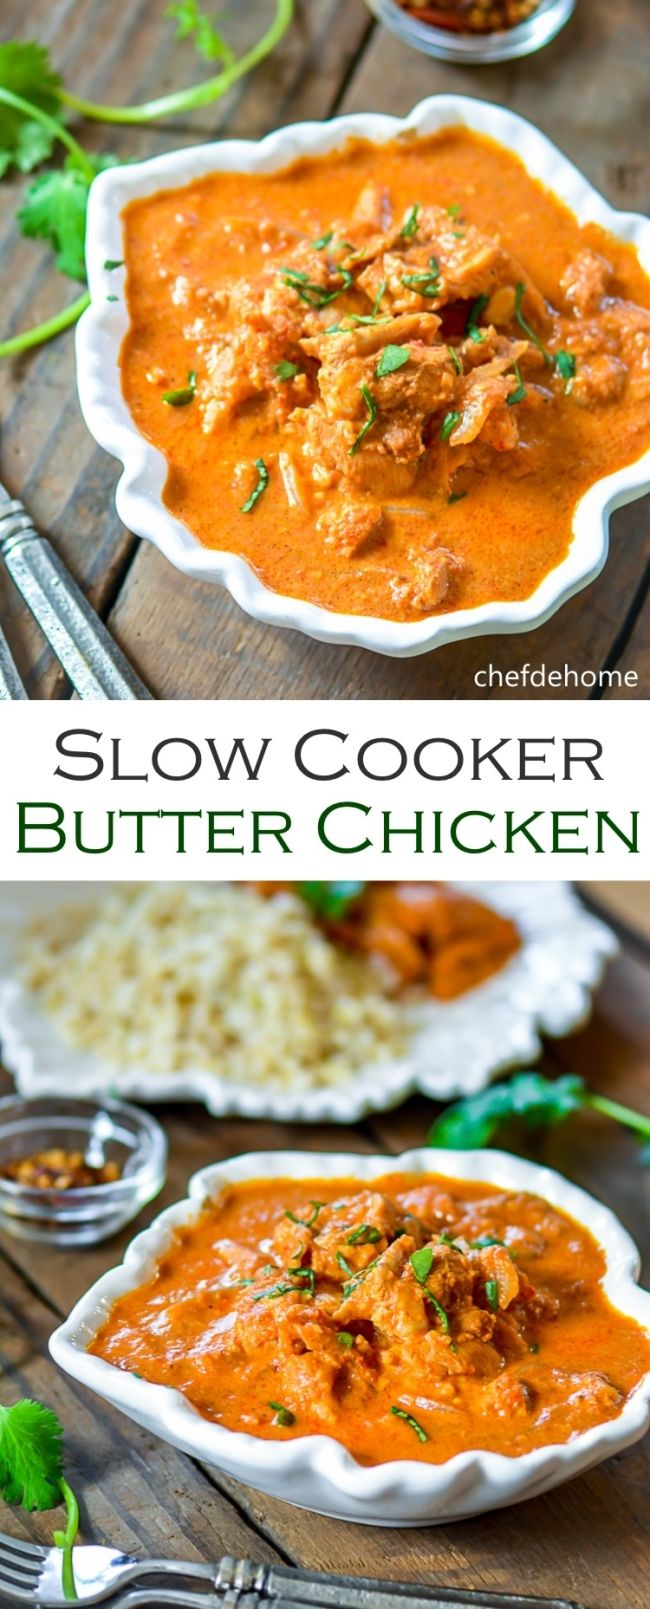 Slow Cooker Restaurant Style Butter Chicken for an Easy Homemade Indian Chicken Dinner